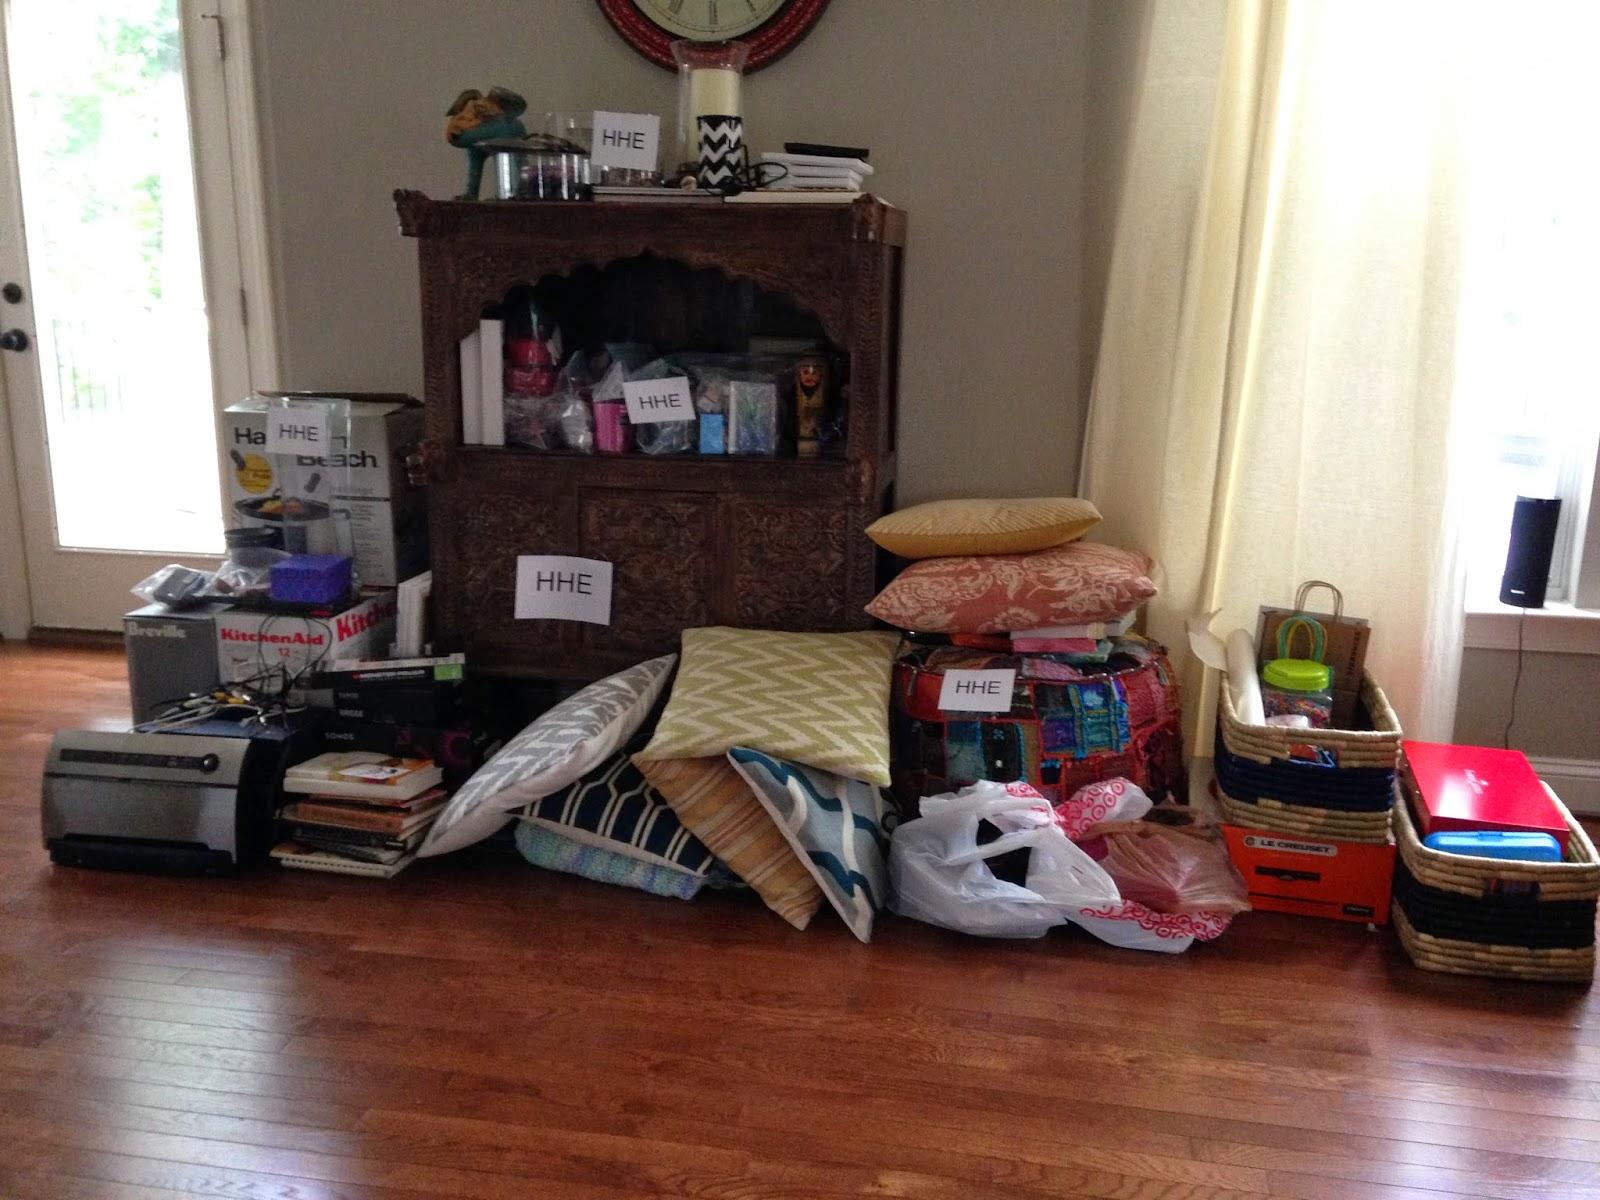 Bedroom Packing